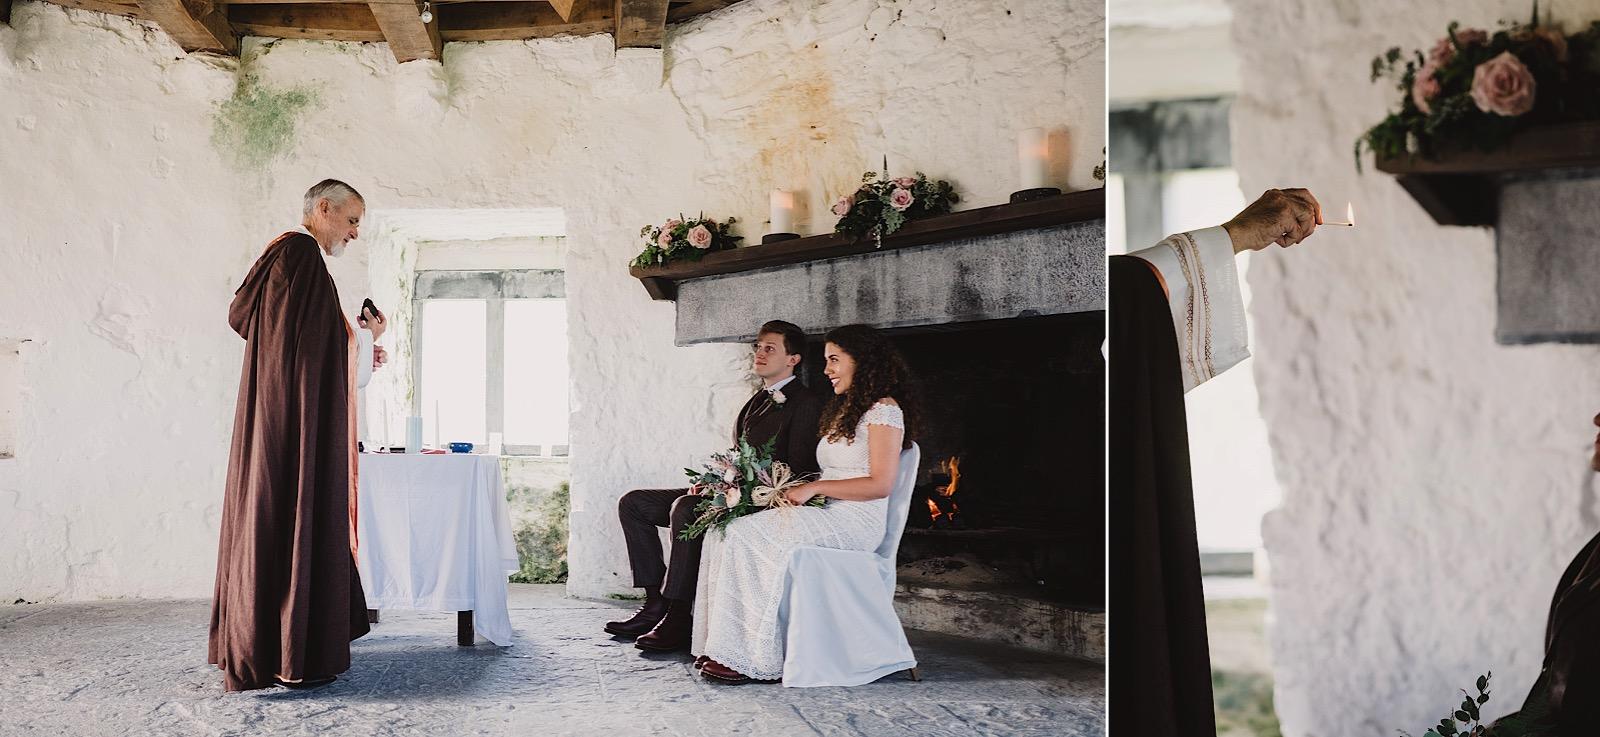 Elopement_Wedding_Ireland_Cliffs_of_moher0045